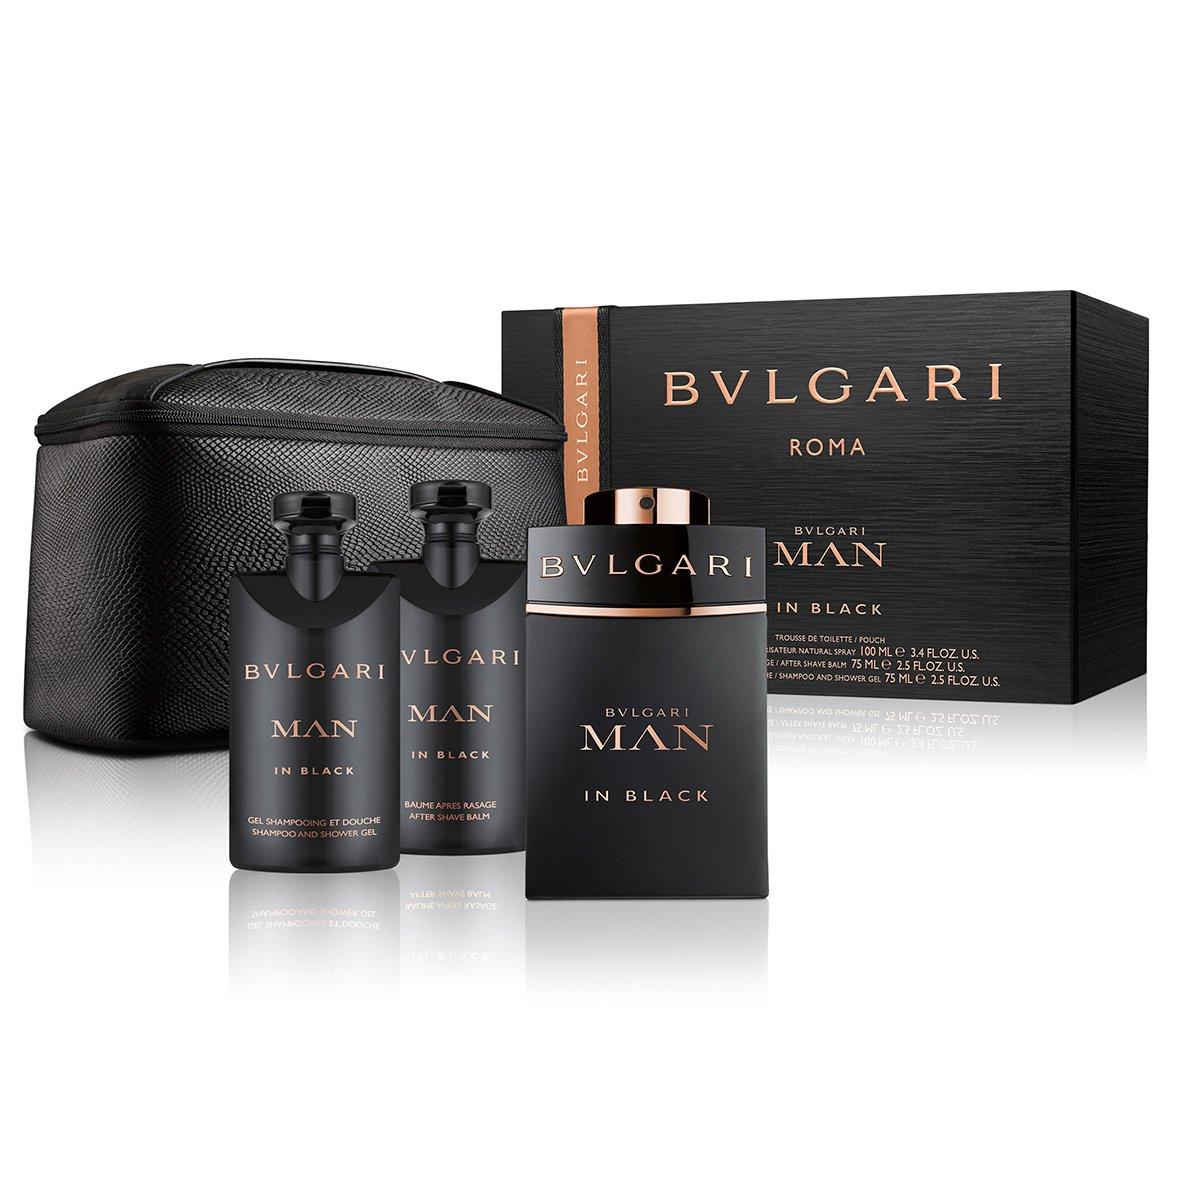 44417df5b68 Bvlgari Kit Perfume Masculino Man In Black 100ml + Gel de Banho 75ml + Pós  Barba 75ml + Bolsa - Compre Agora